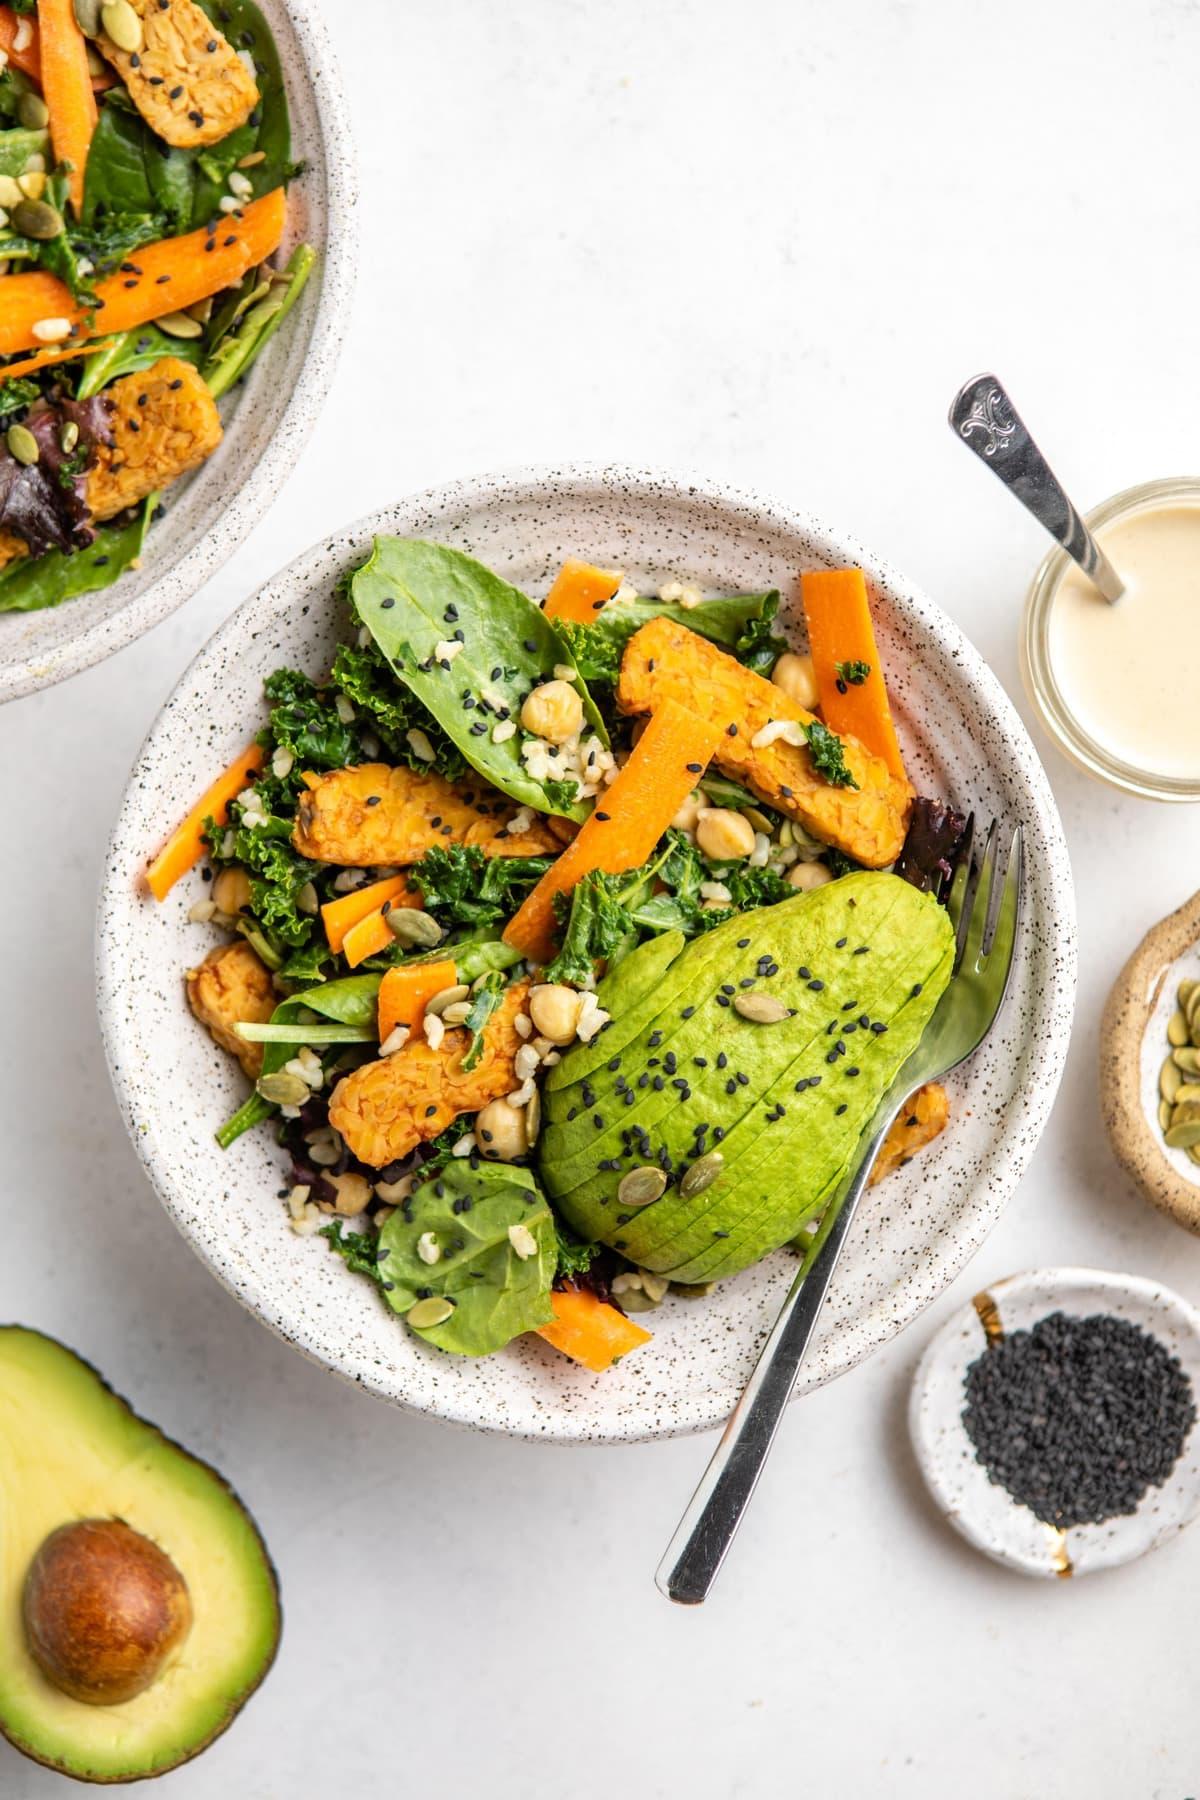 harvest salad in white speckled bowl on white background